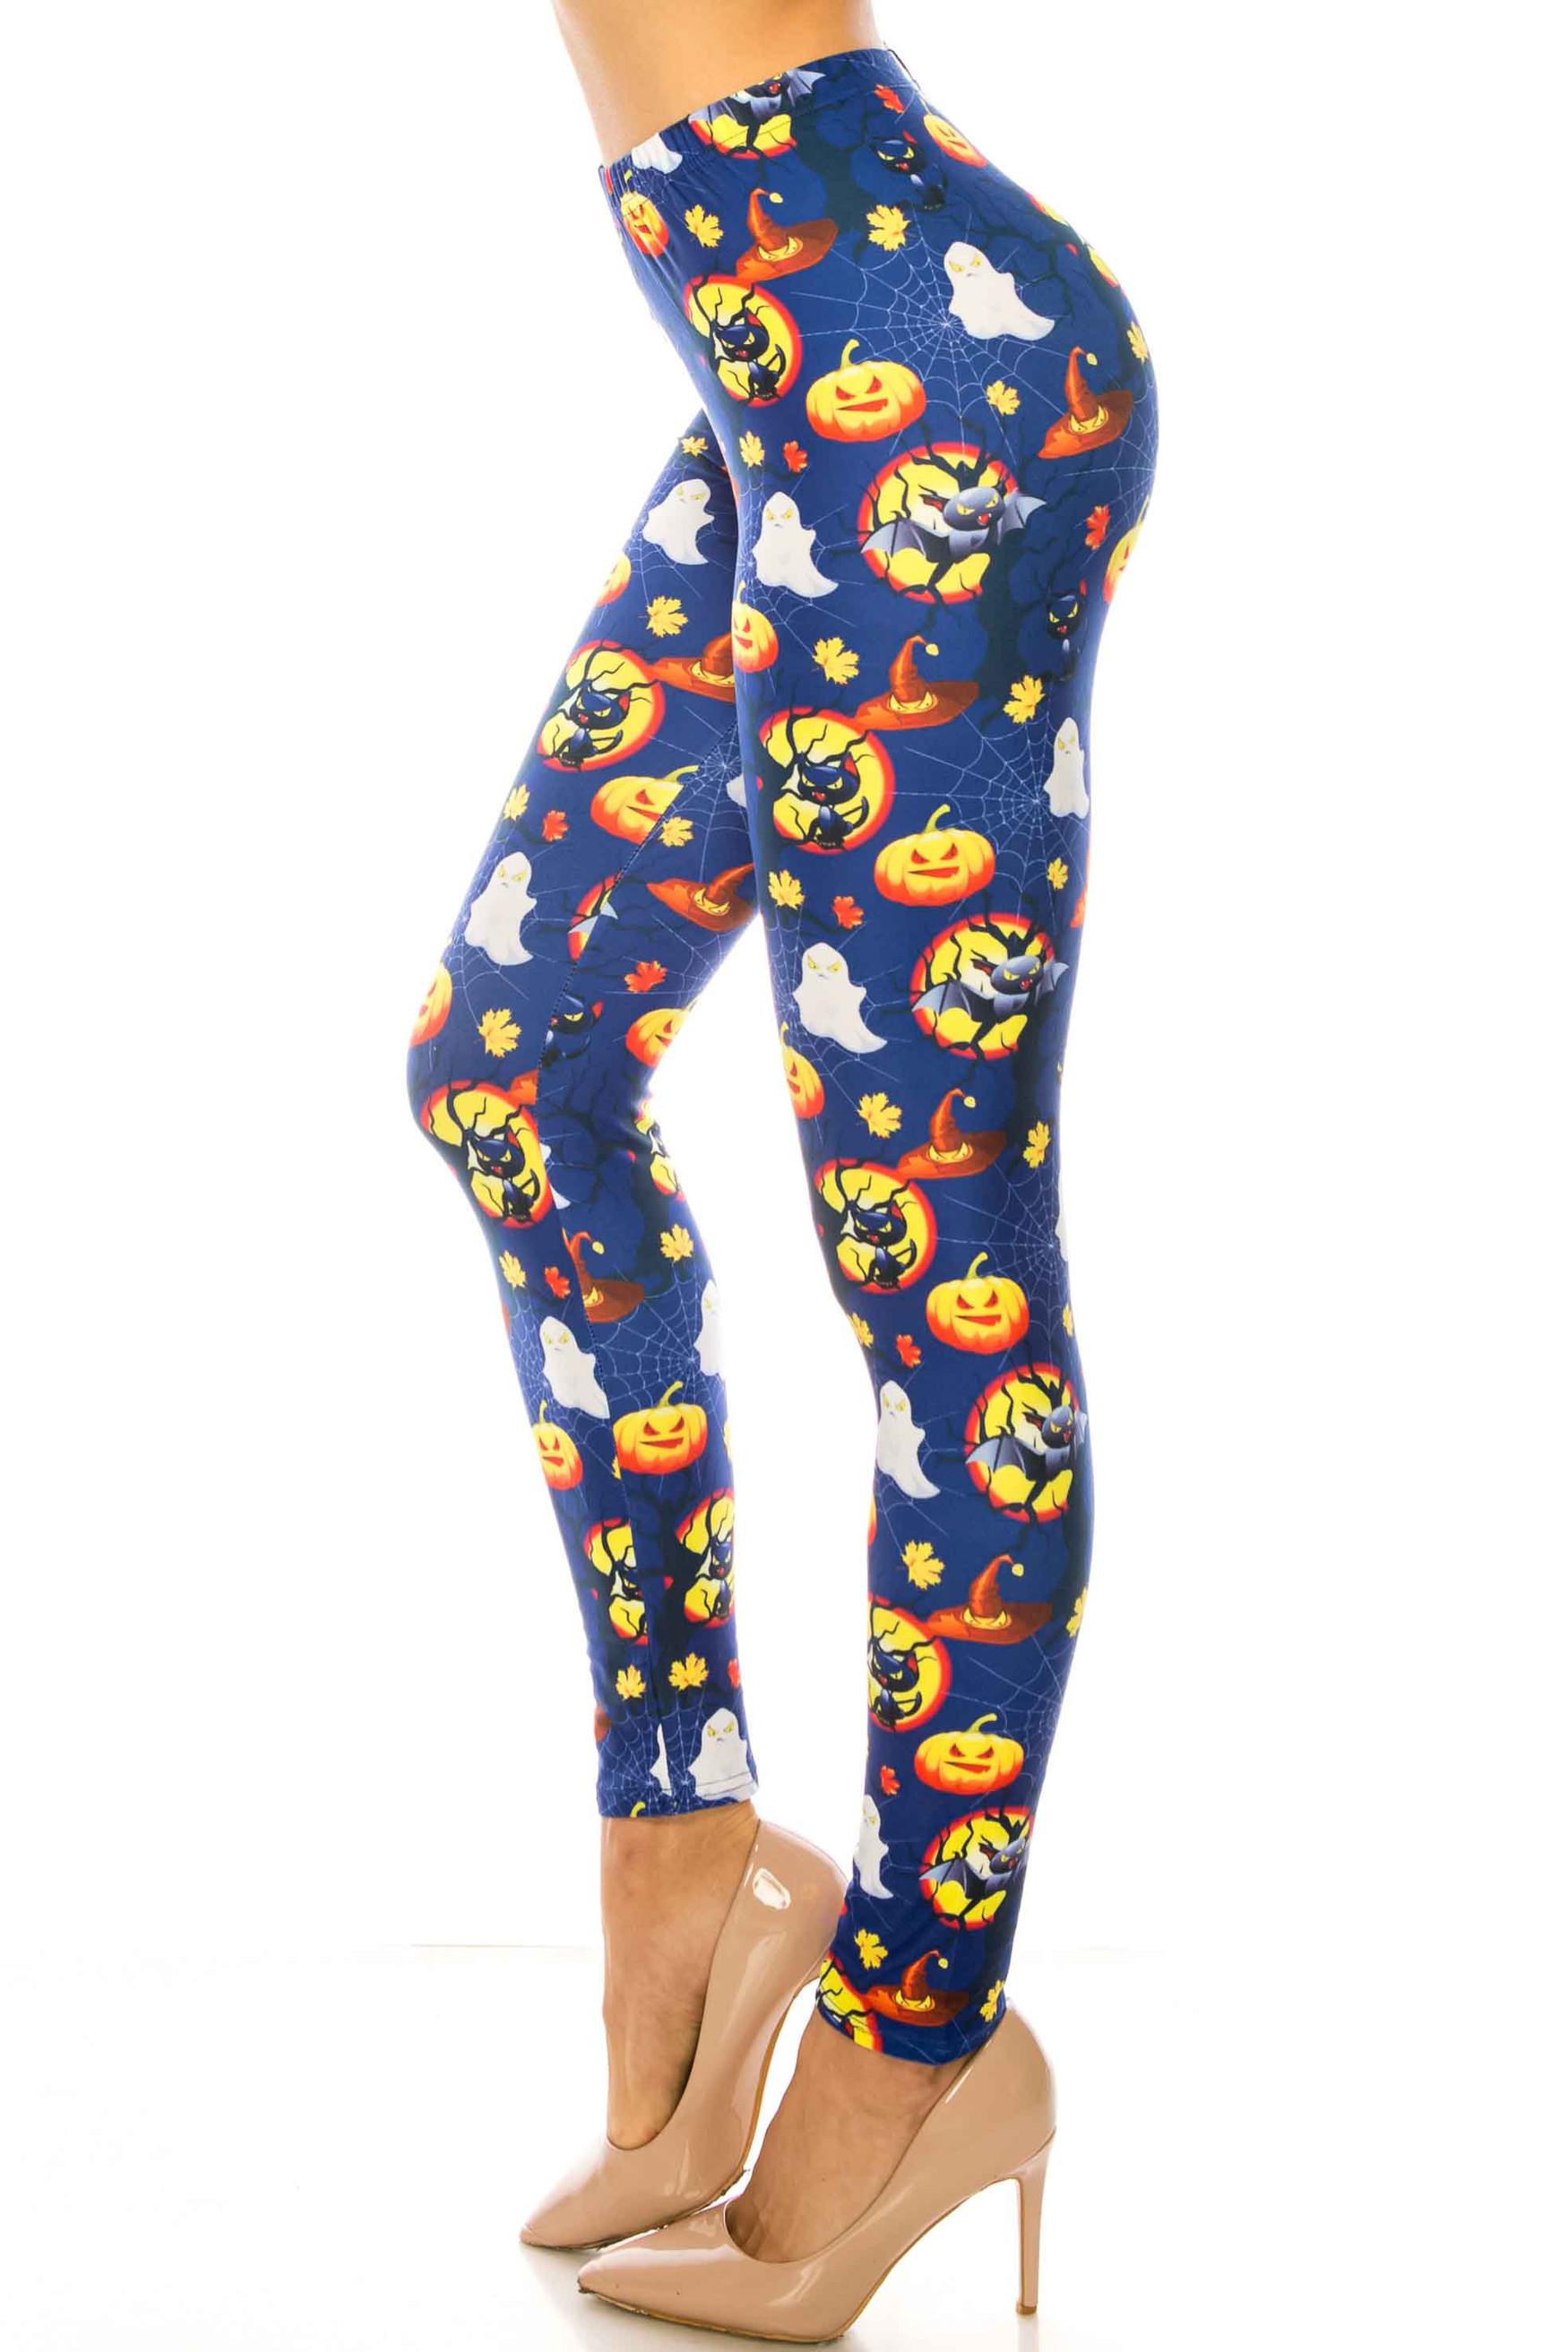 Creamy Soft Halloween Critters Plus Size Leggings - USA Fashion™